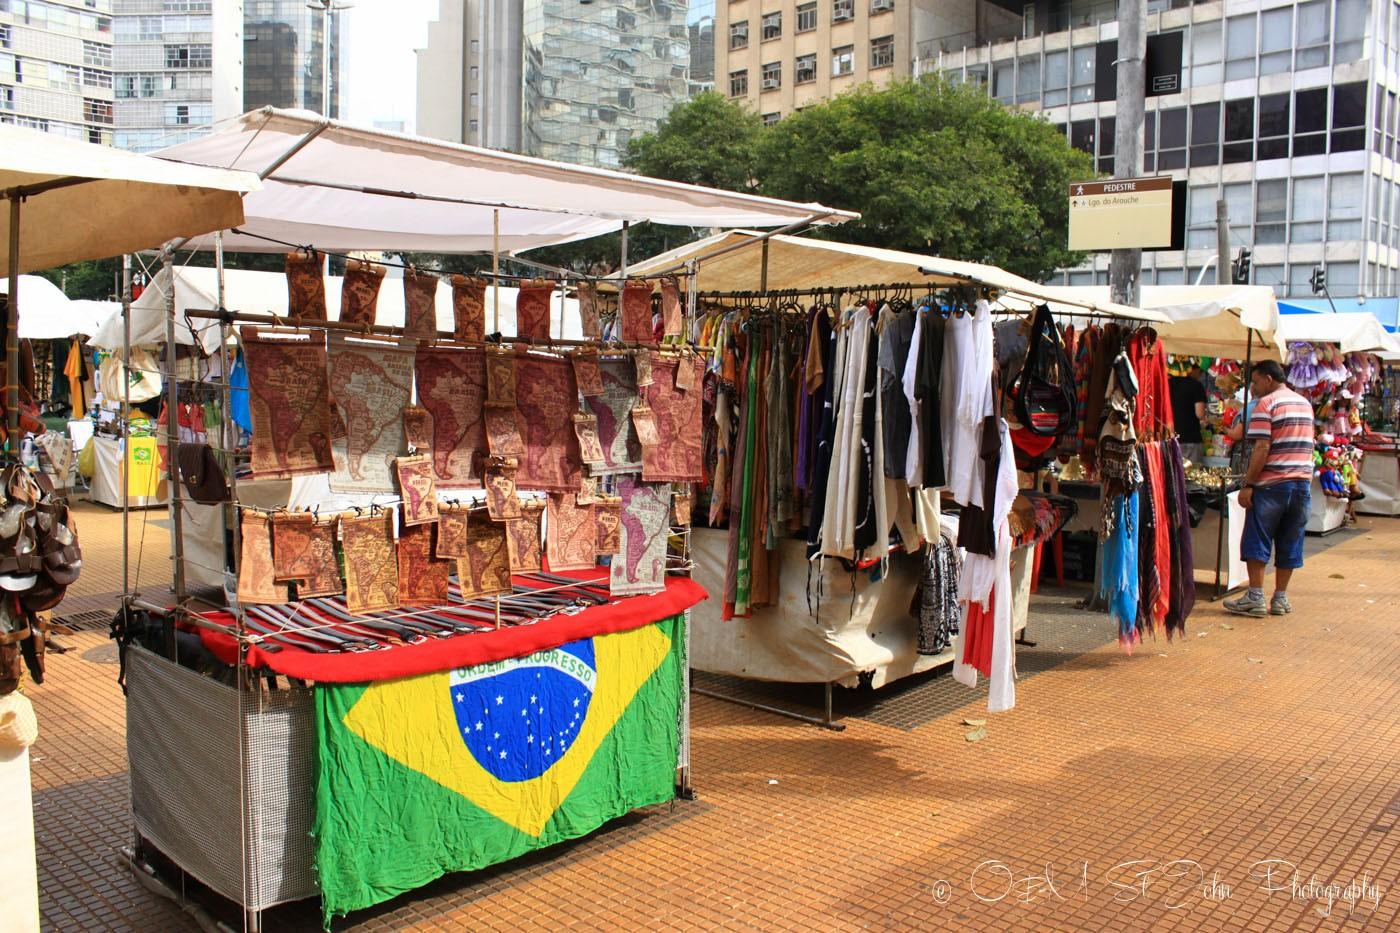 Open air market in Sao Paulo, Brazil